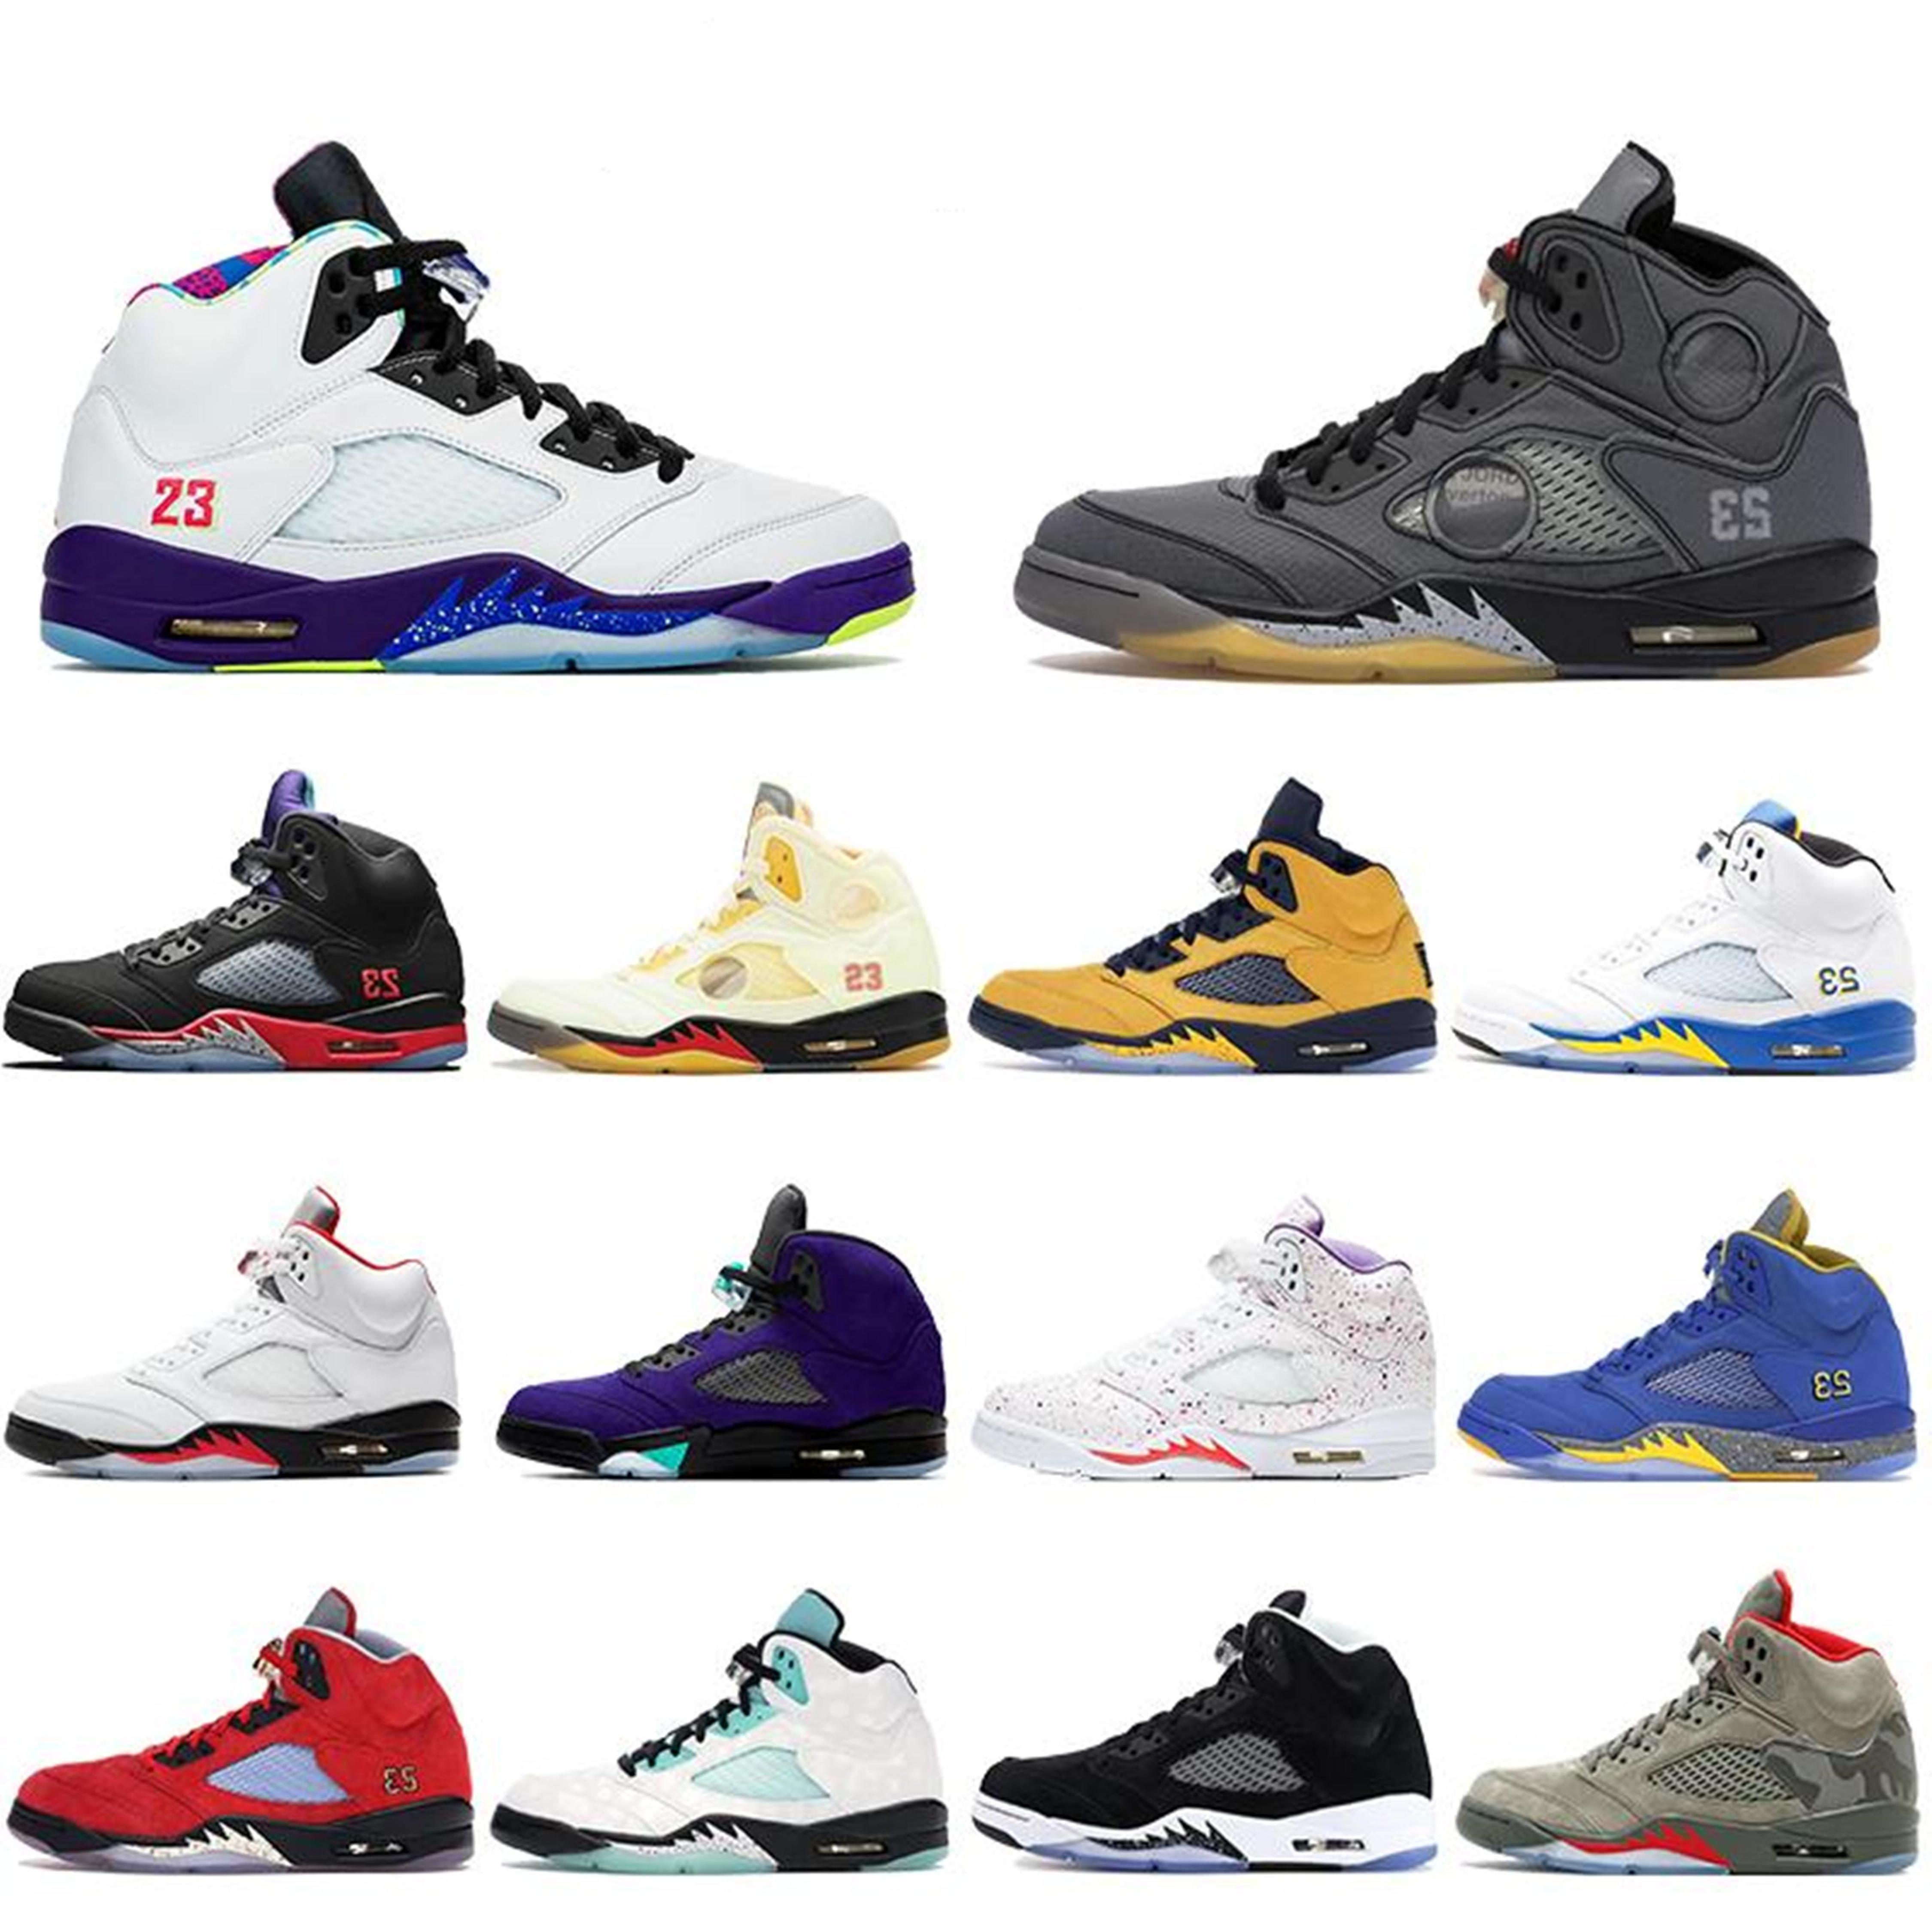 Nouvelle voile blanche Jumpman 5 5s Top 3 Feu Red Oregon Hommes Basketball Chaussures de basket-ball Michigan Huile Gris Sneakers Baskets Sports Mens Sports